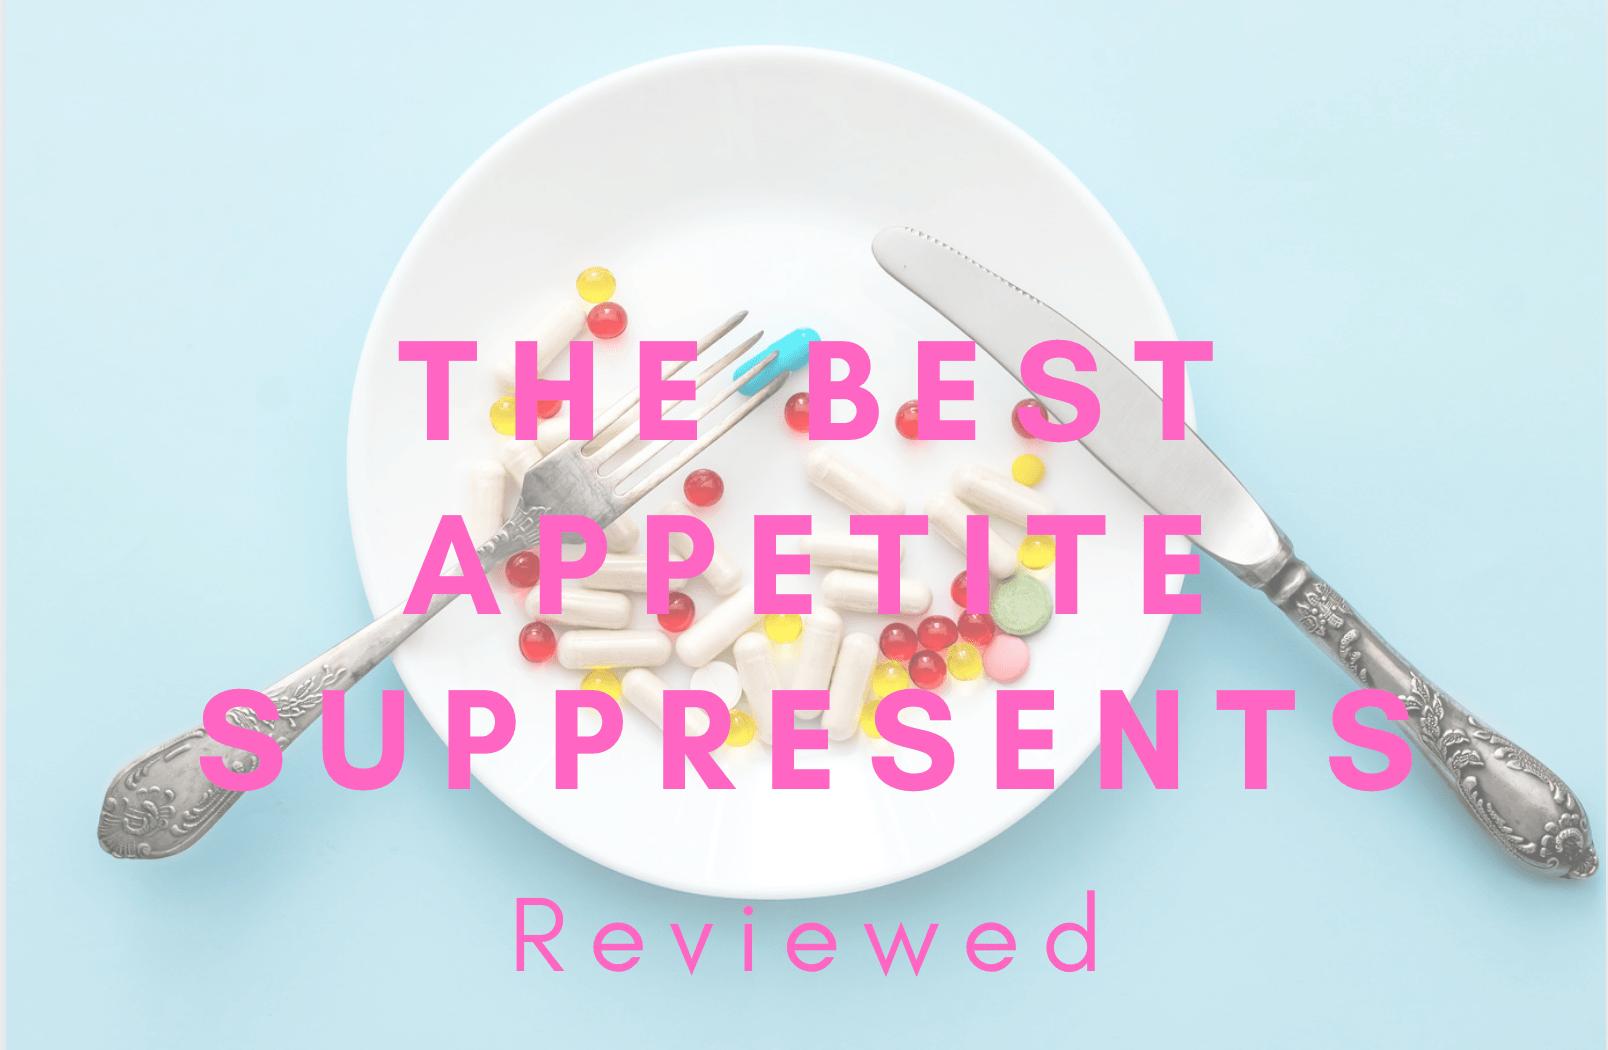 Best Appetite Suppressants